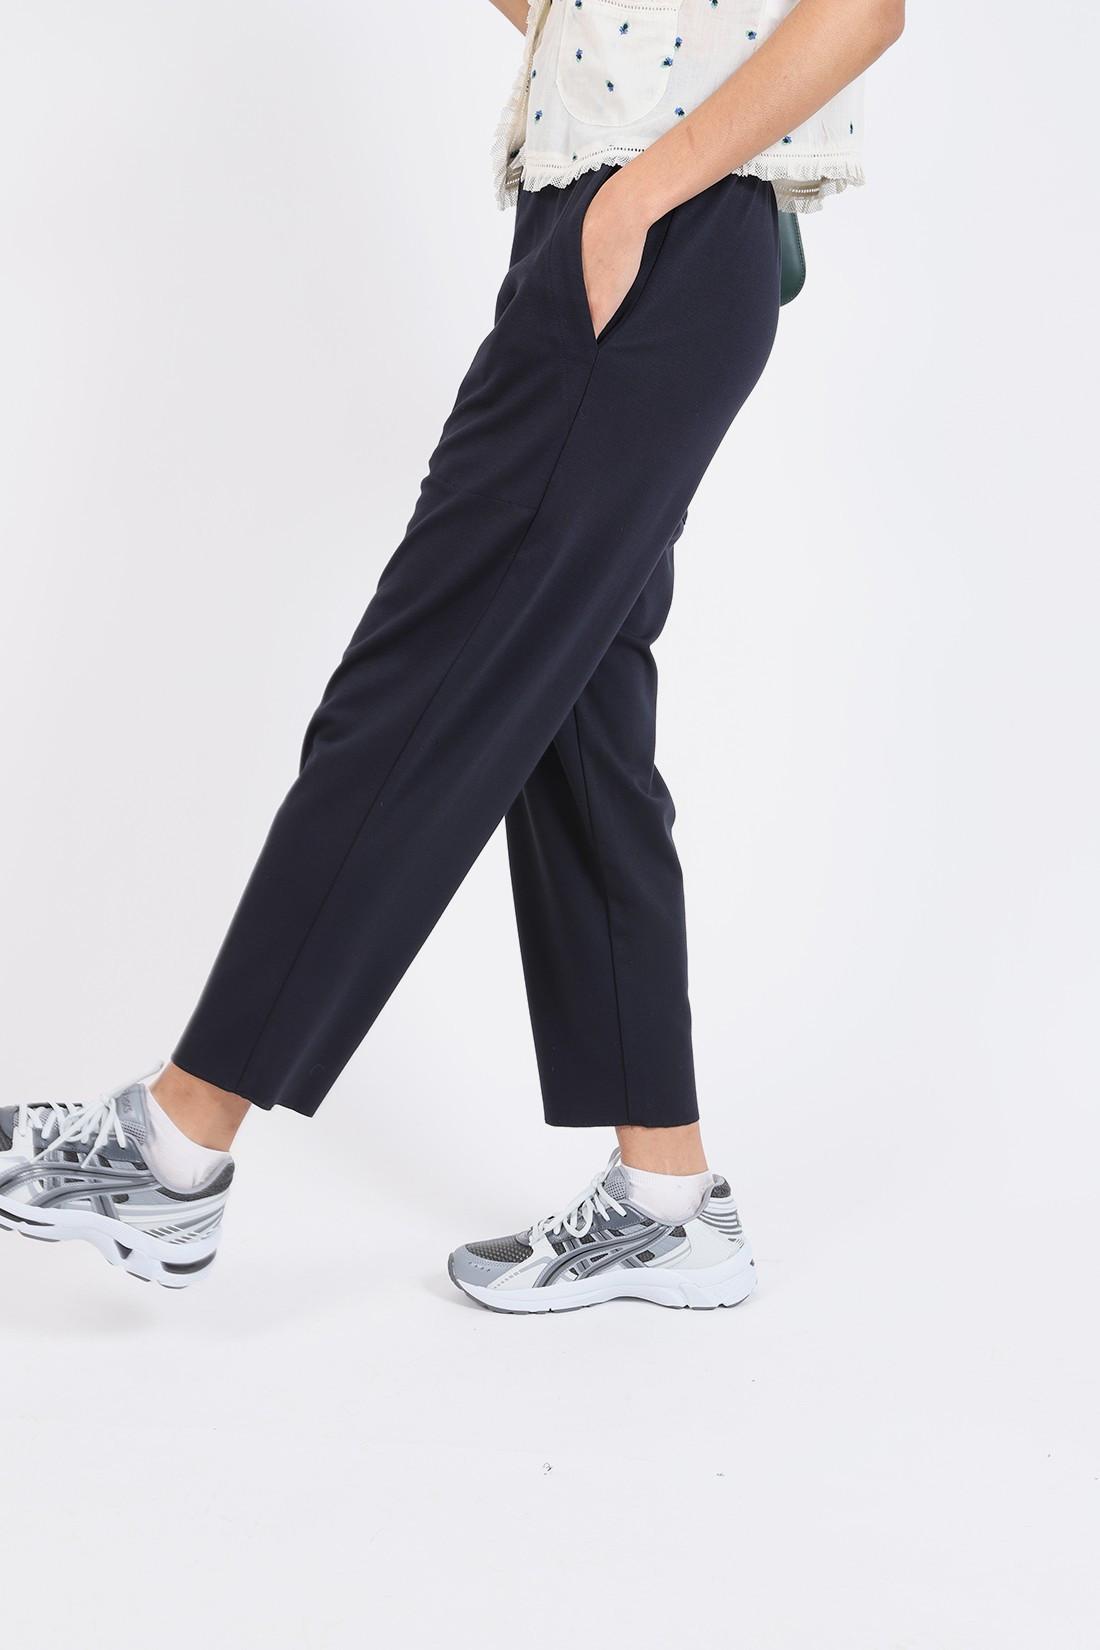 BARENA FOR WOMAN / Pantalon joie isso Navy